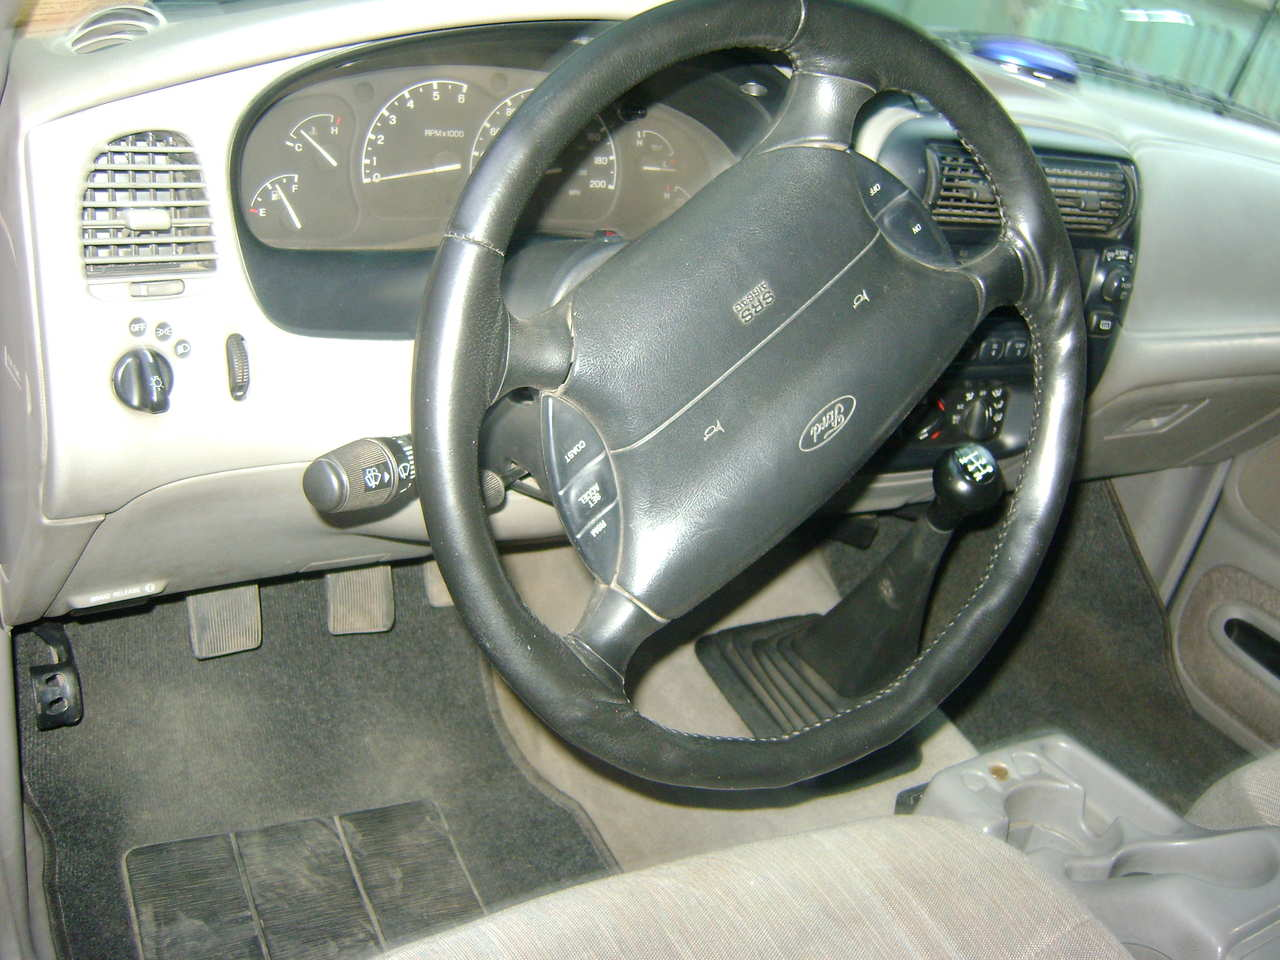 1997 Ford Explorer Specs Engine Size 4000cm3 Fuel Type Gasoline Transmission Gearbox Manual